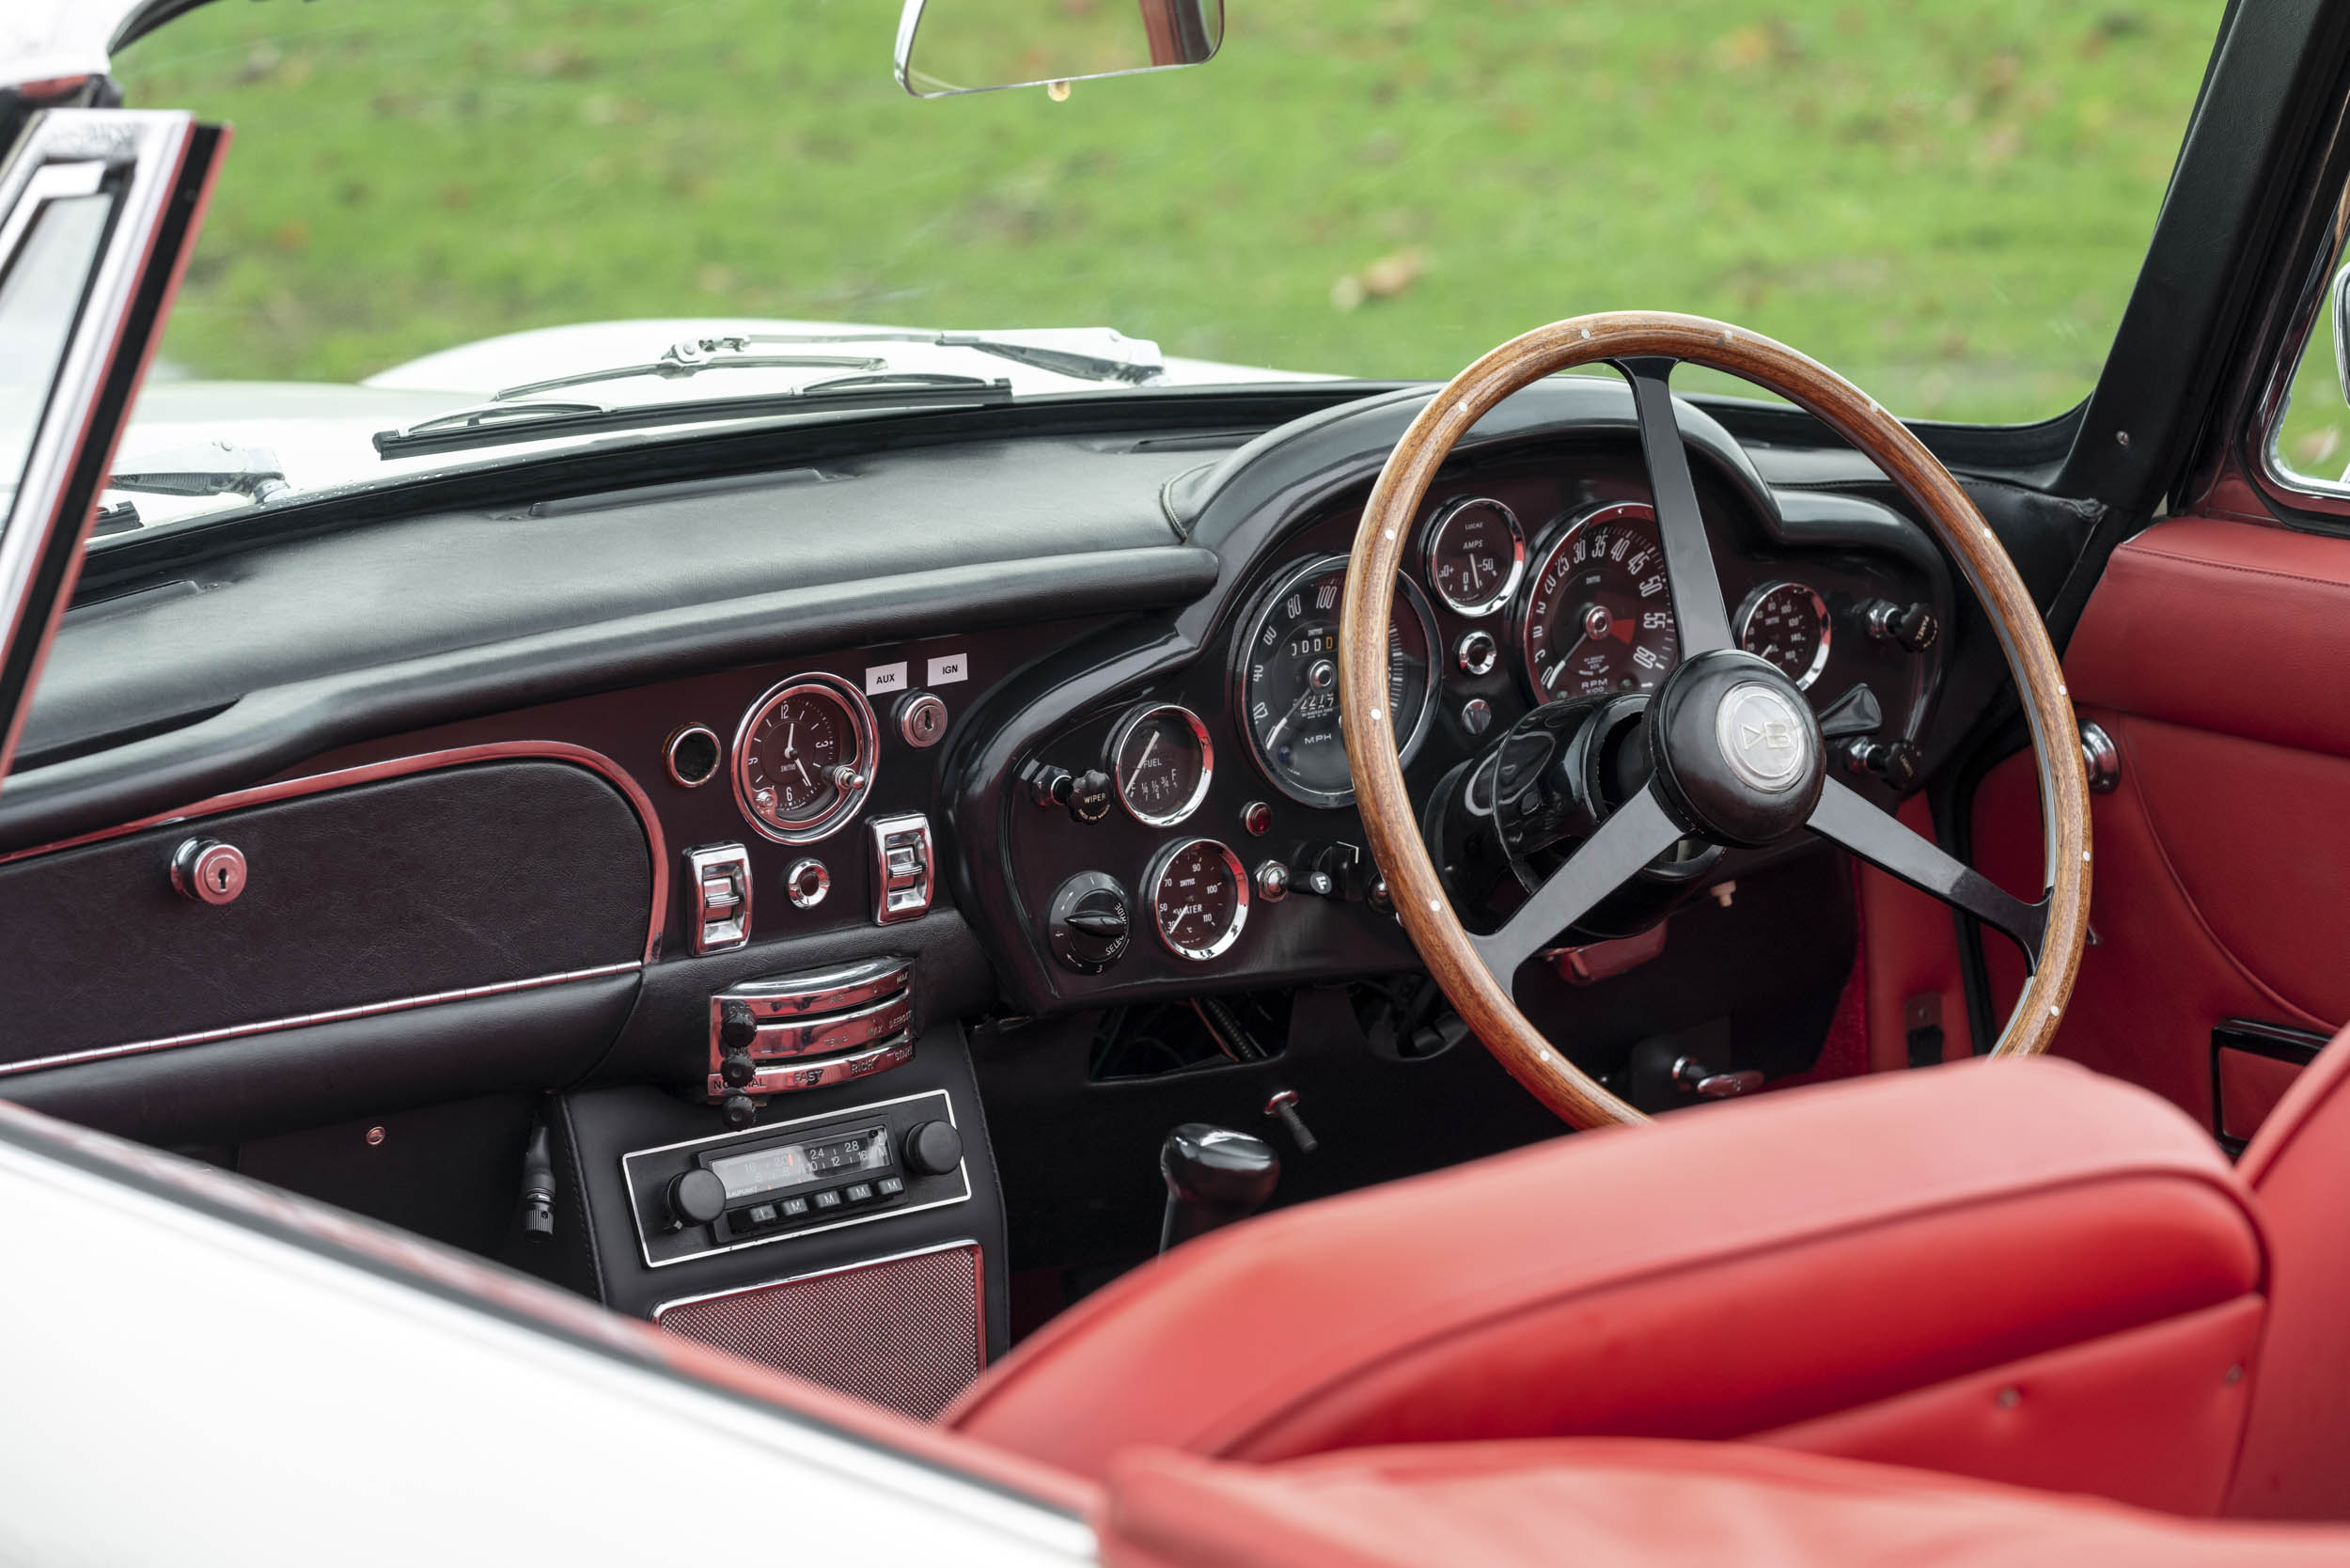 1970 DB6 MkII Volante EV dash